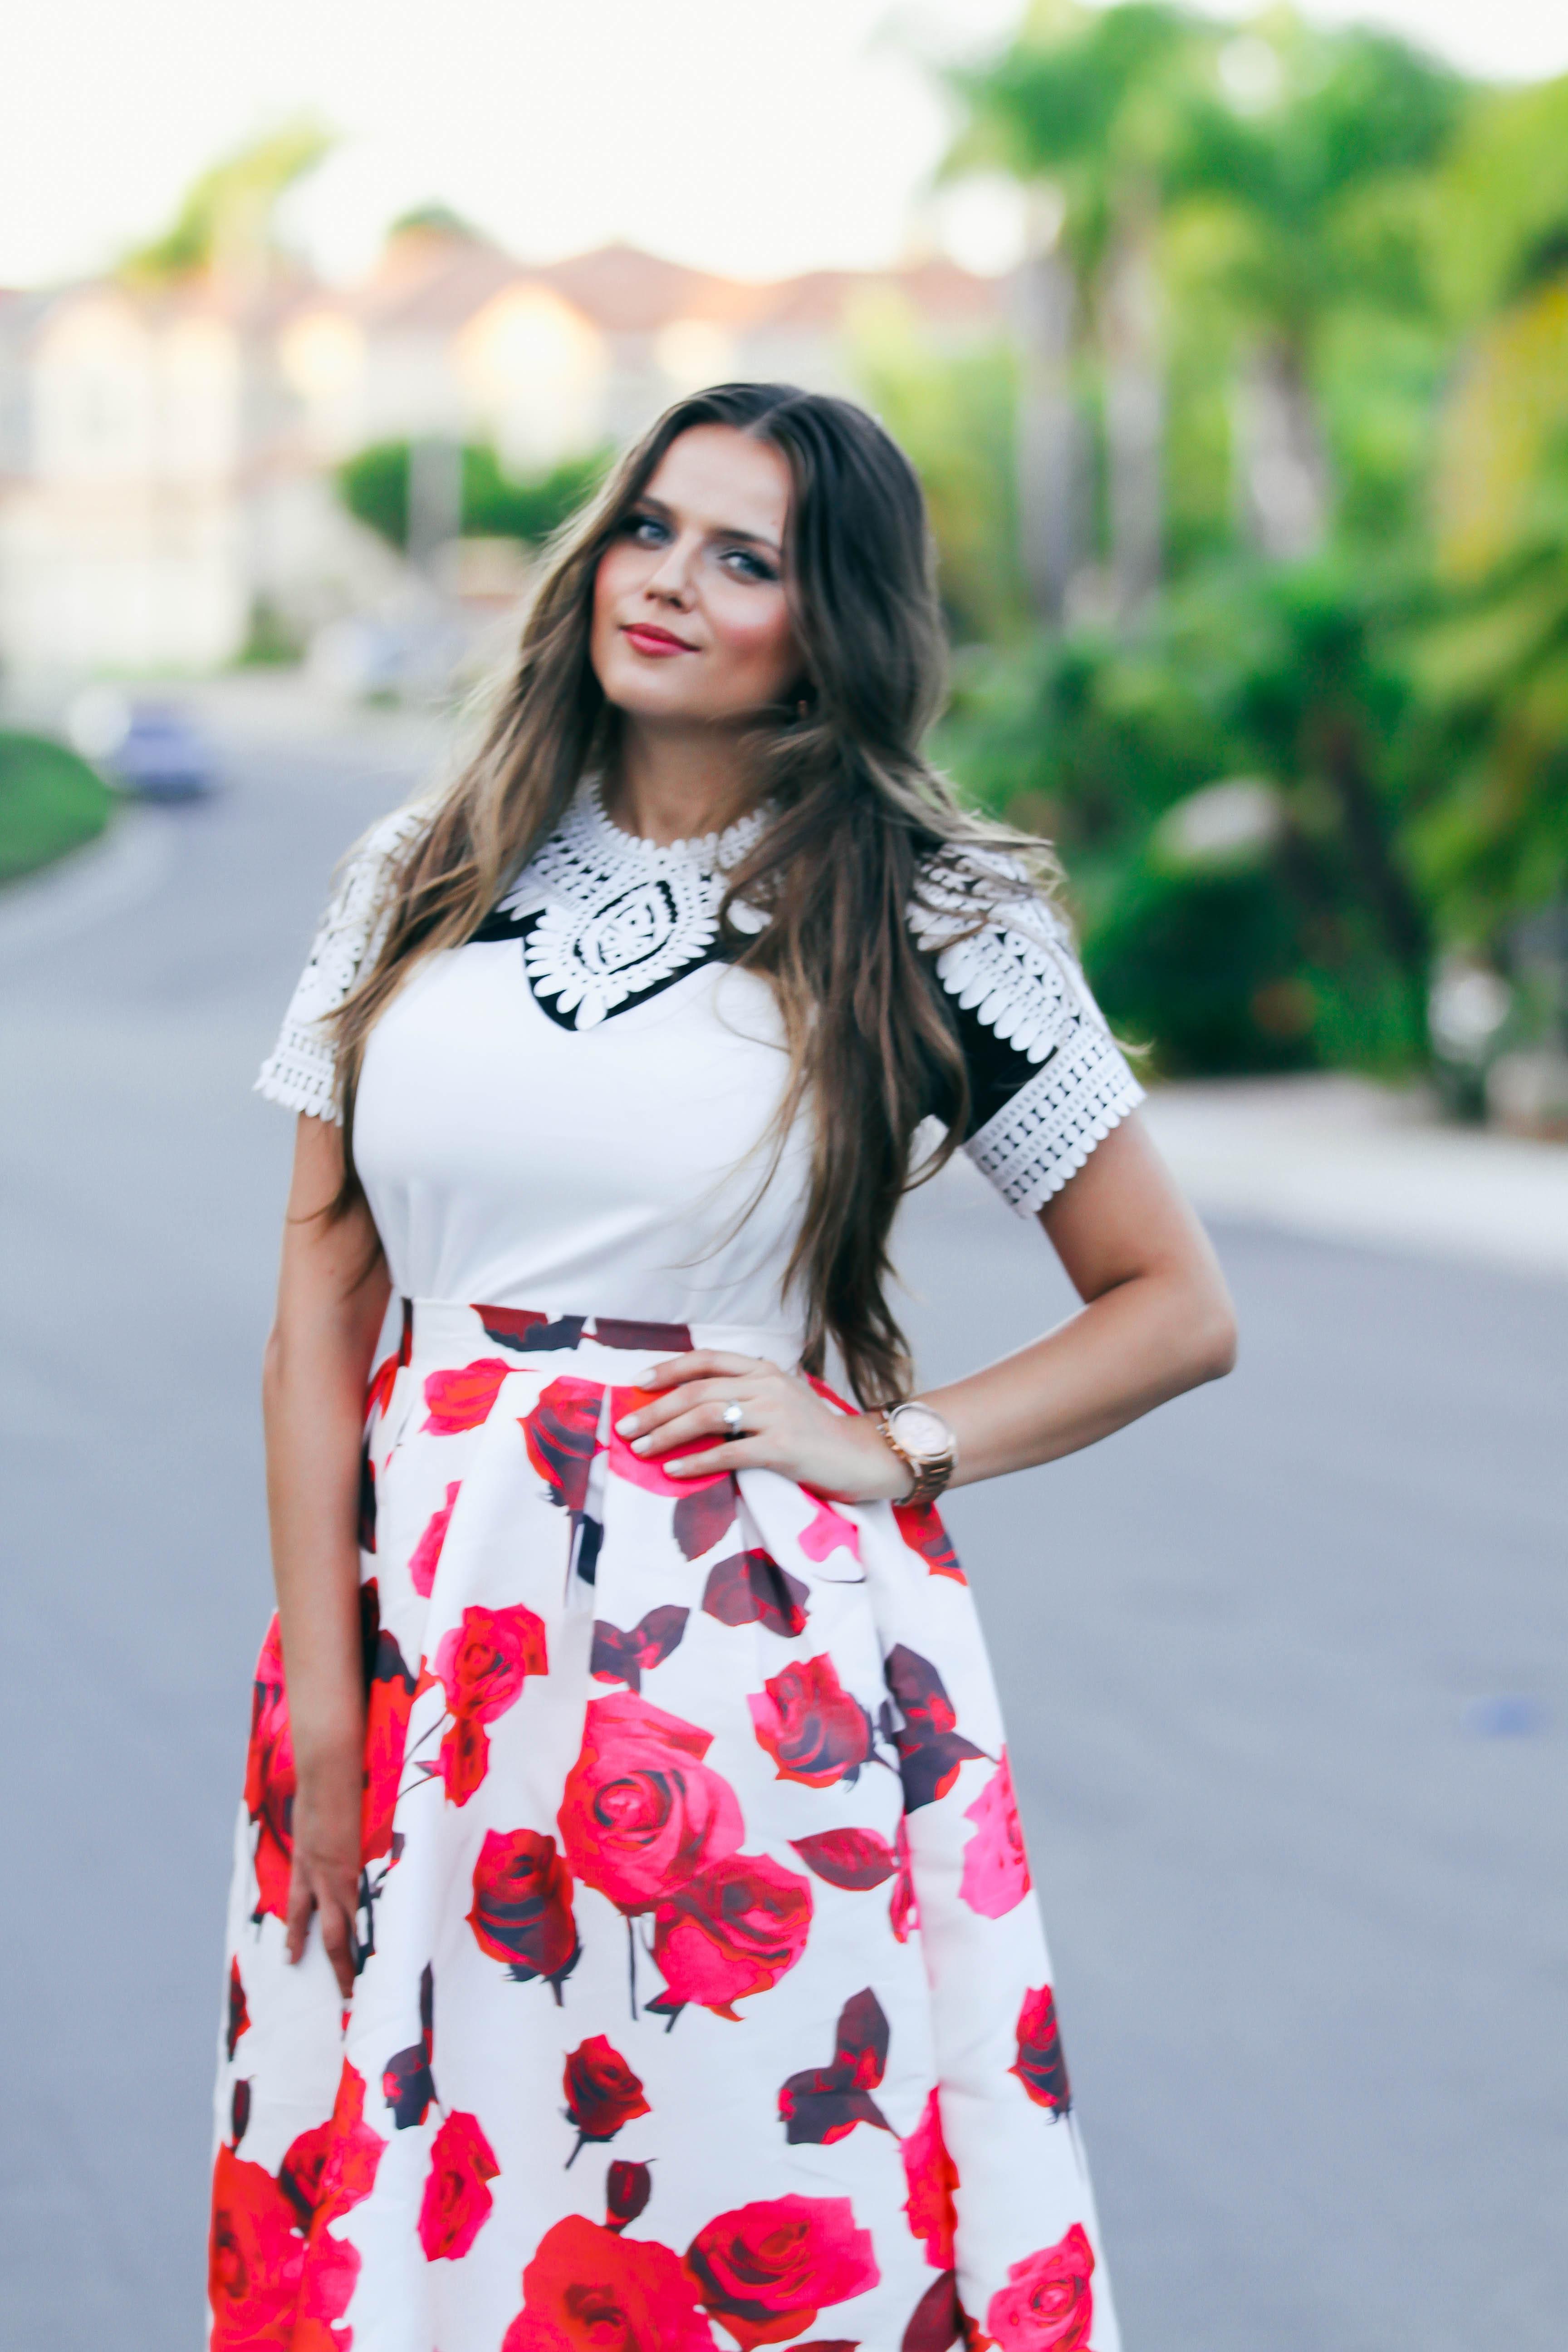 #OOTD // Black & White Cutout Top & Rose Midi Skirt   BondGirlGlam.com